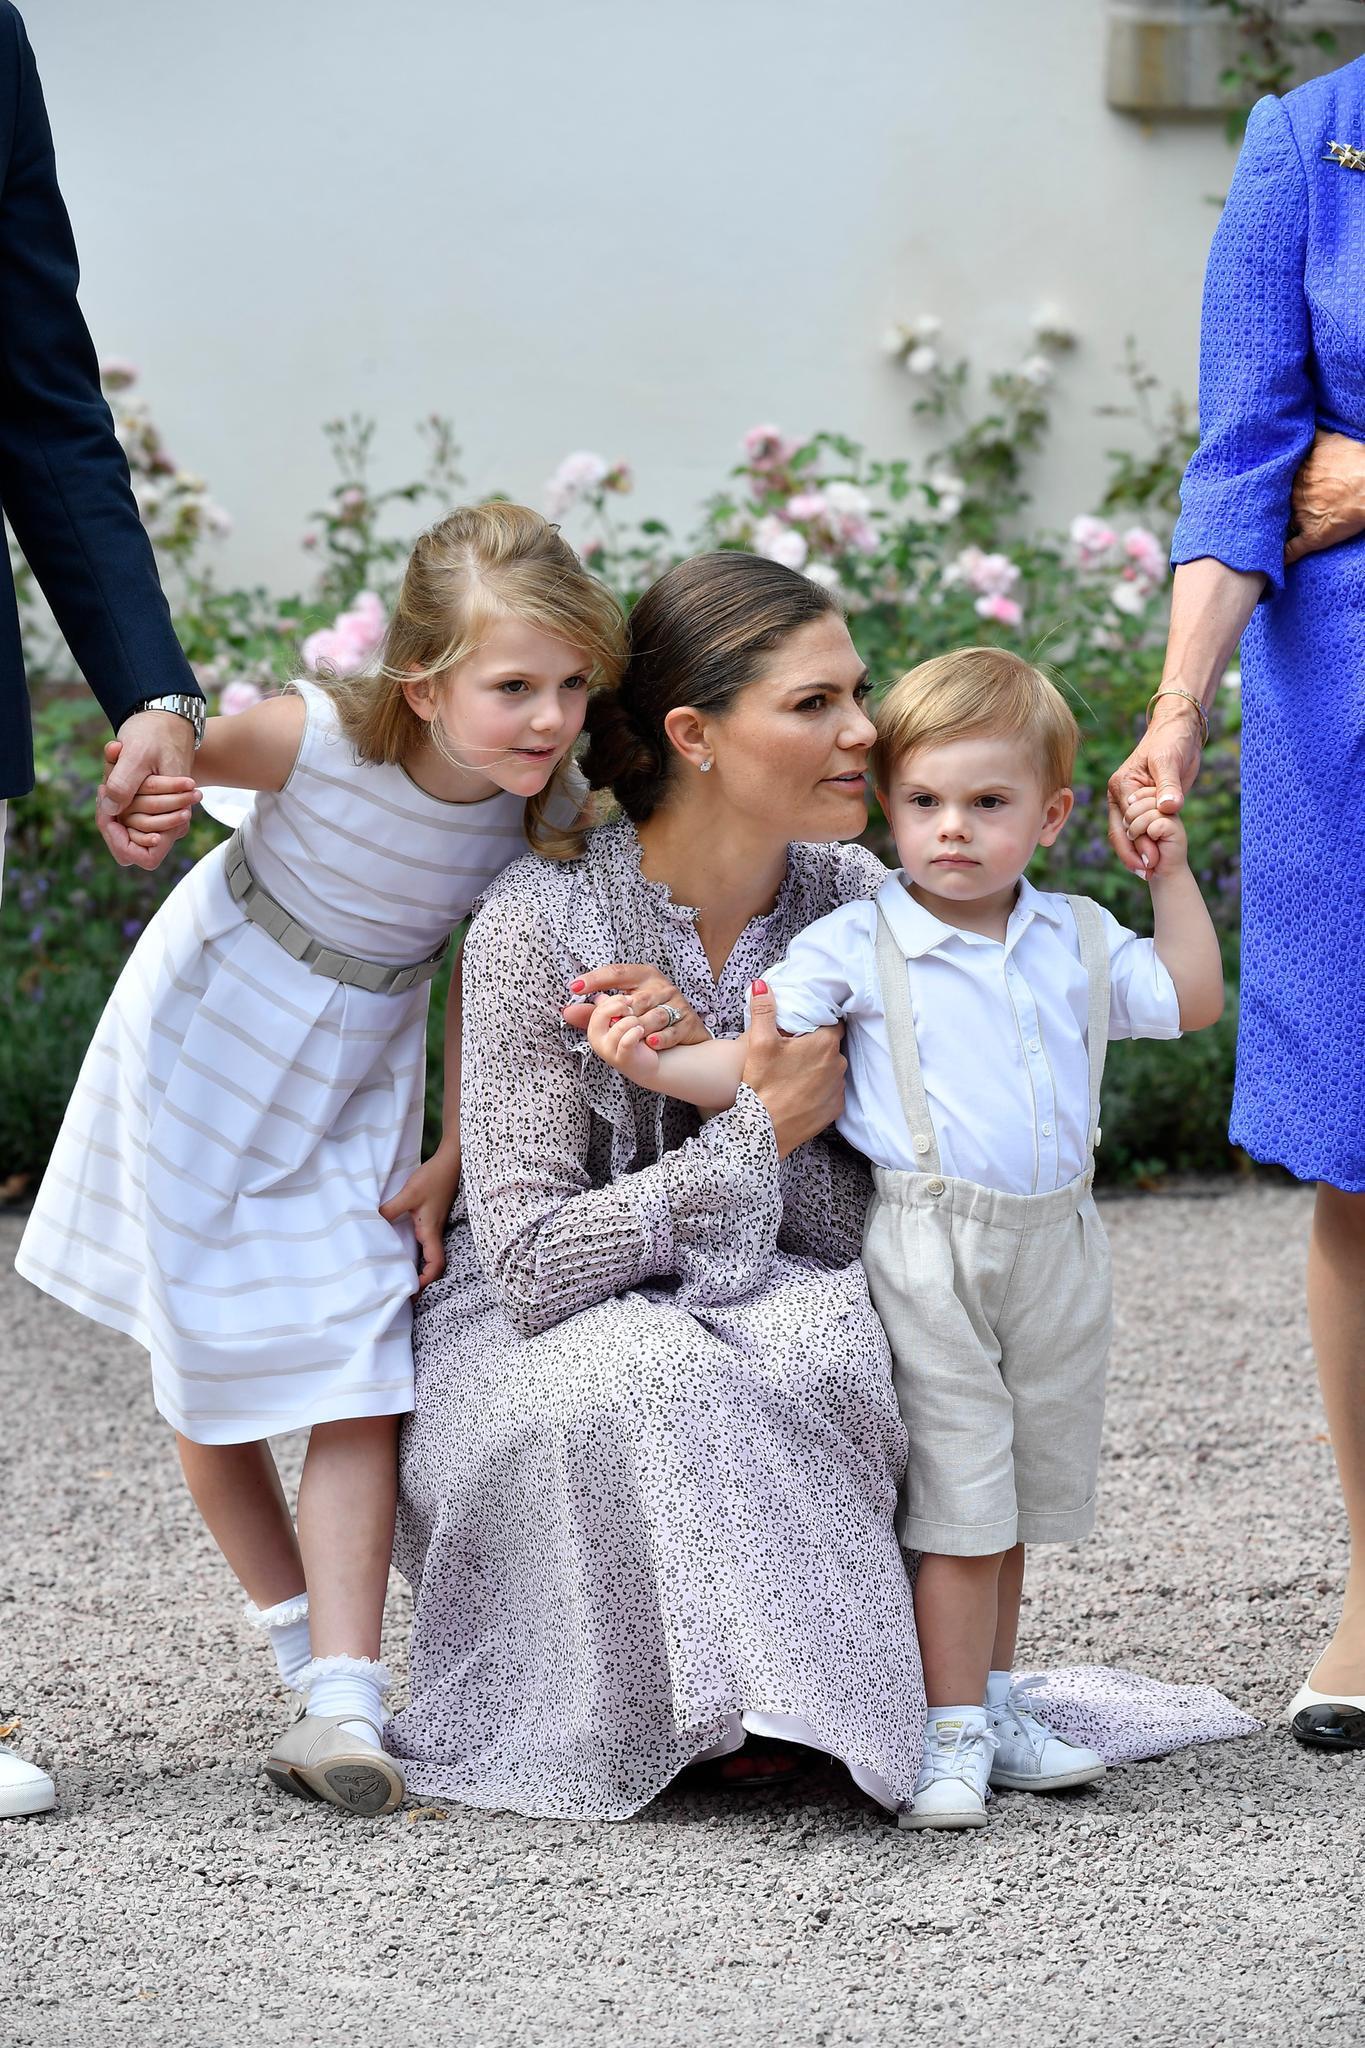 Prinzessin Estelle, Prinzessin Victoria, Prinz Oscar